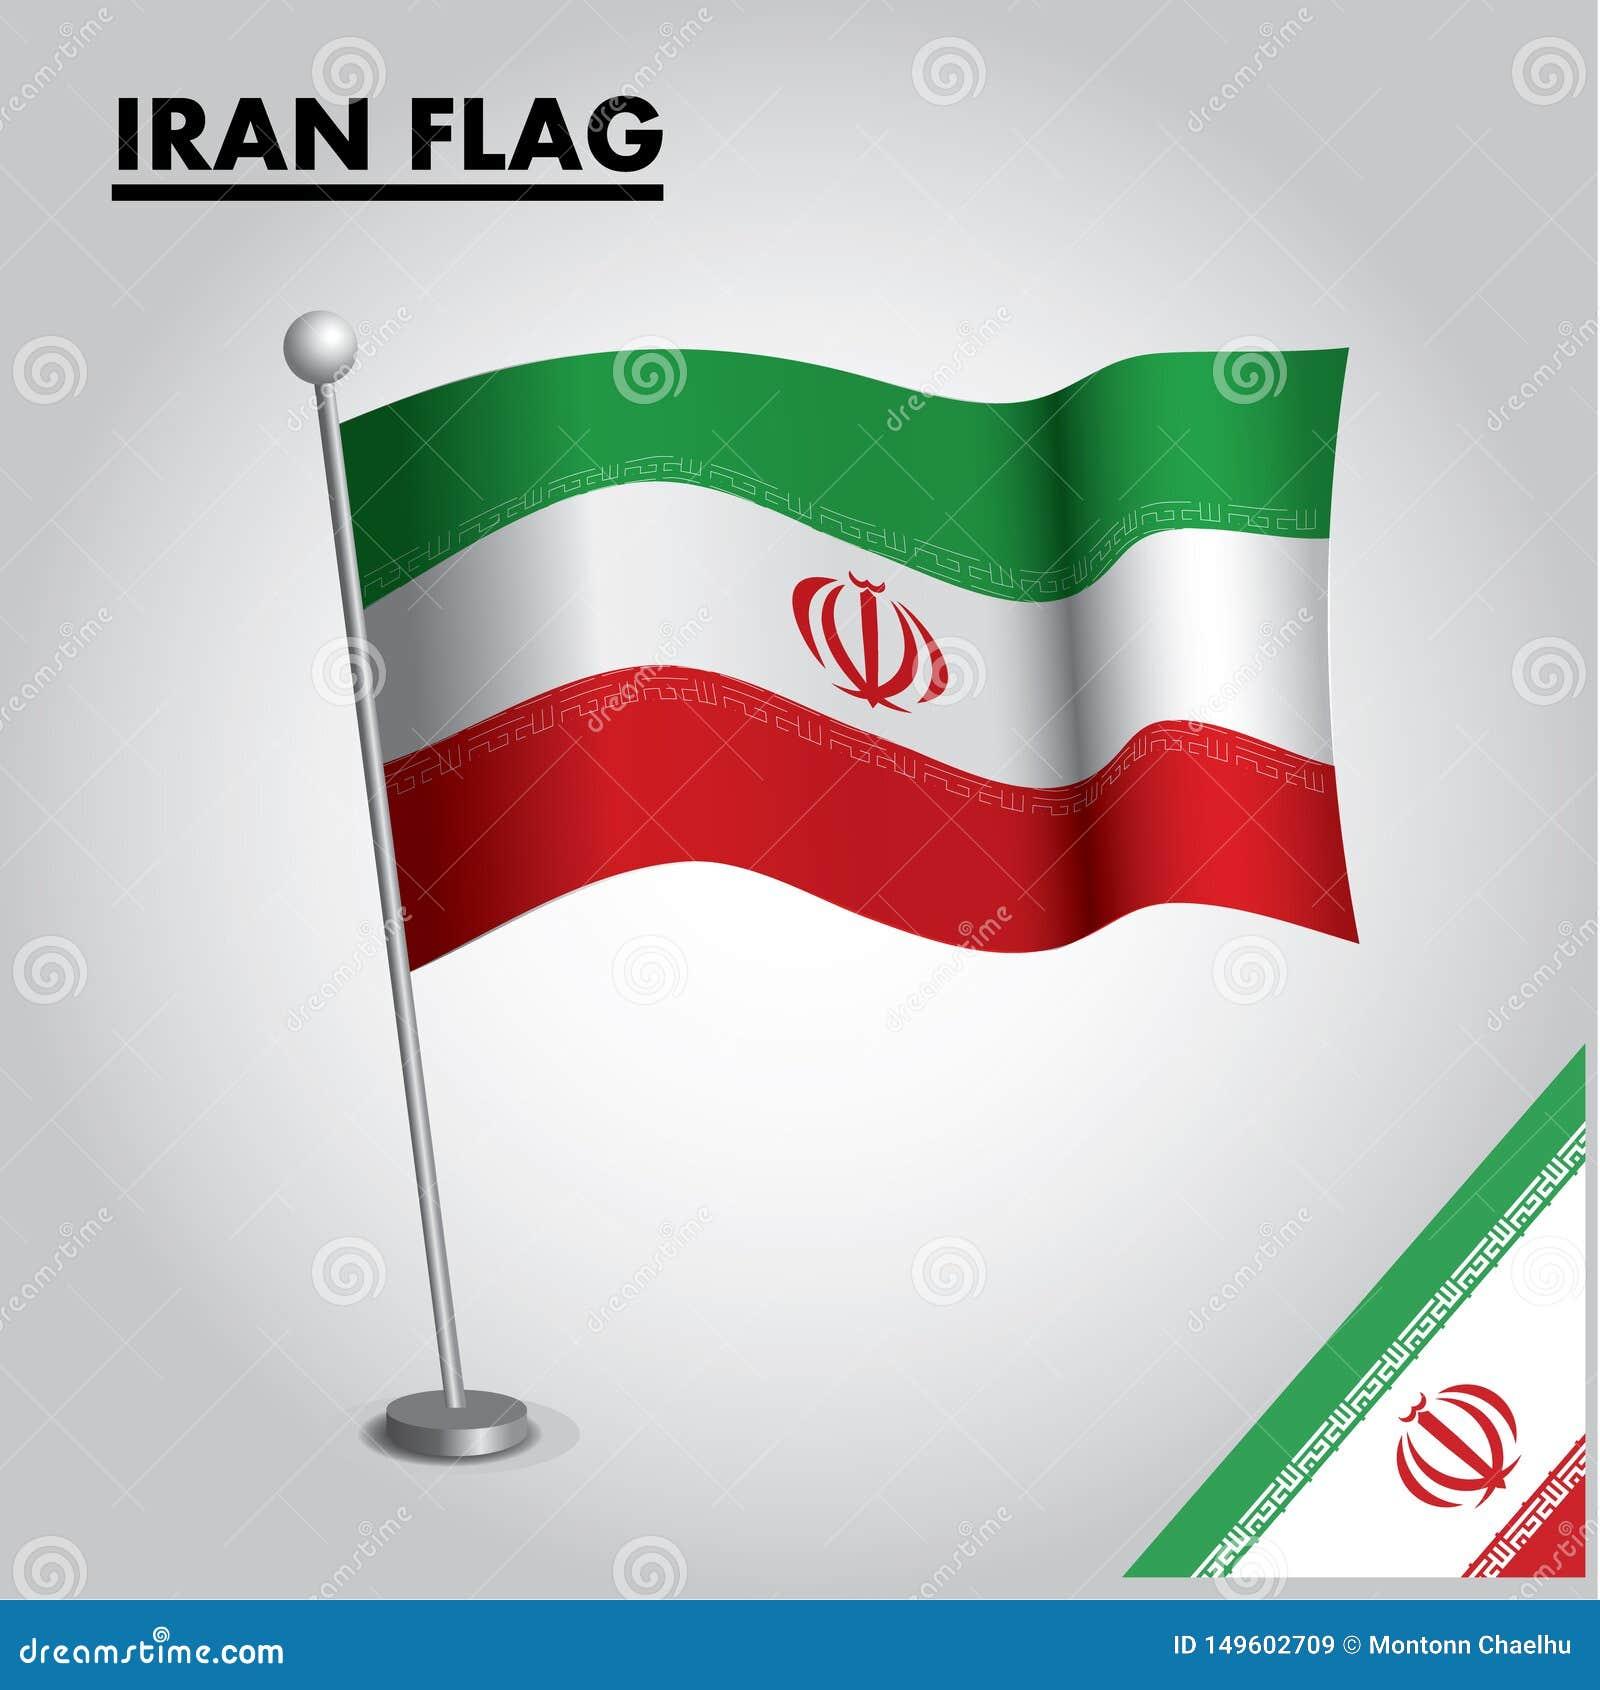 IRAN flag National flag of IRAN on a pole